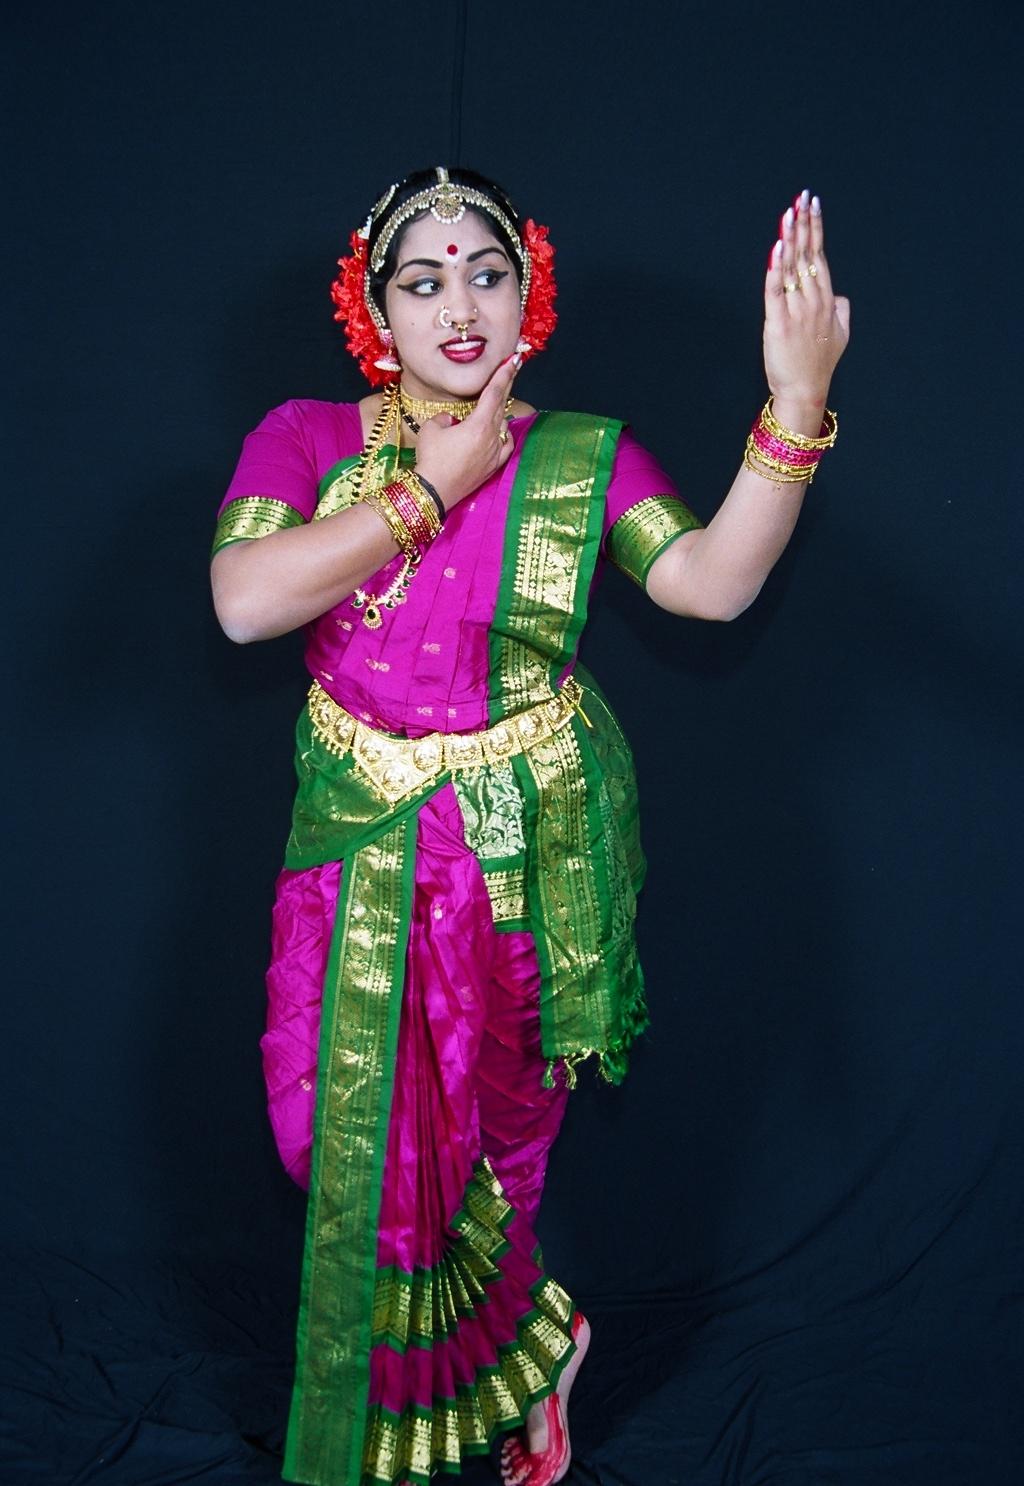 Asha Nair - 2000